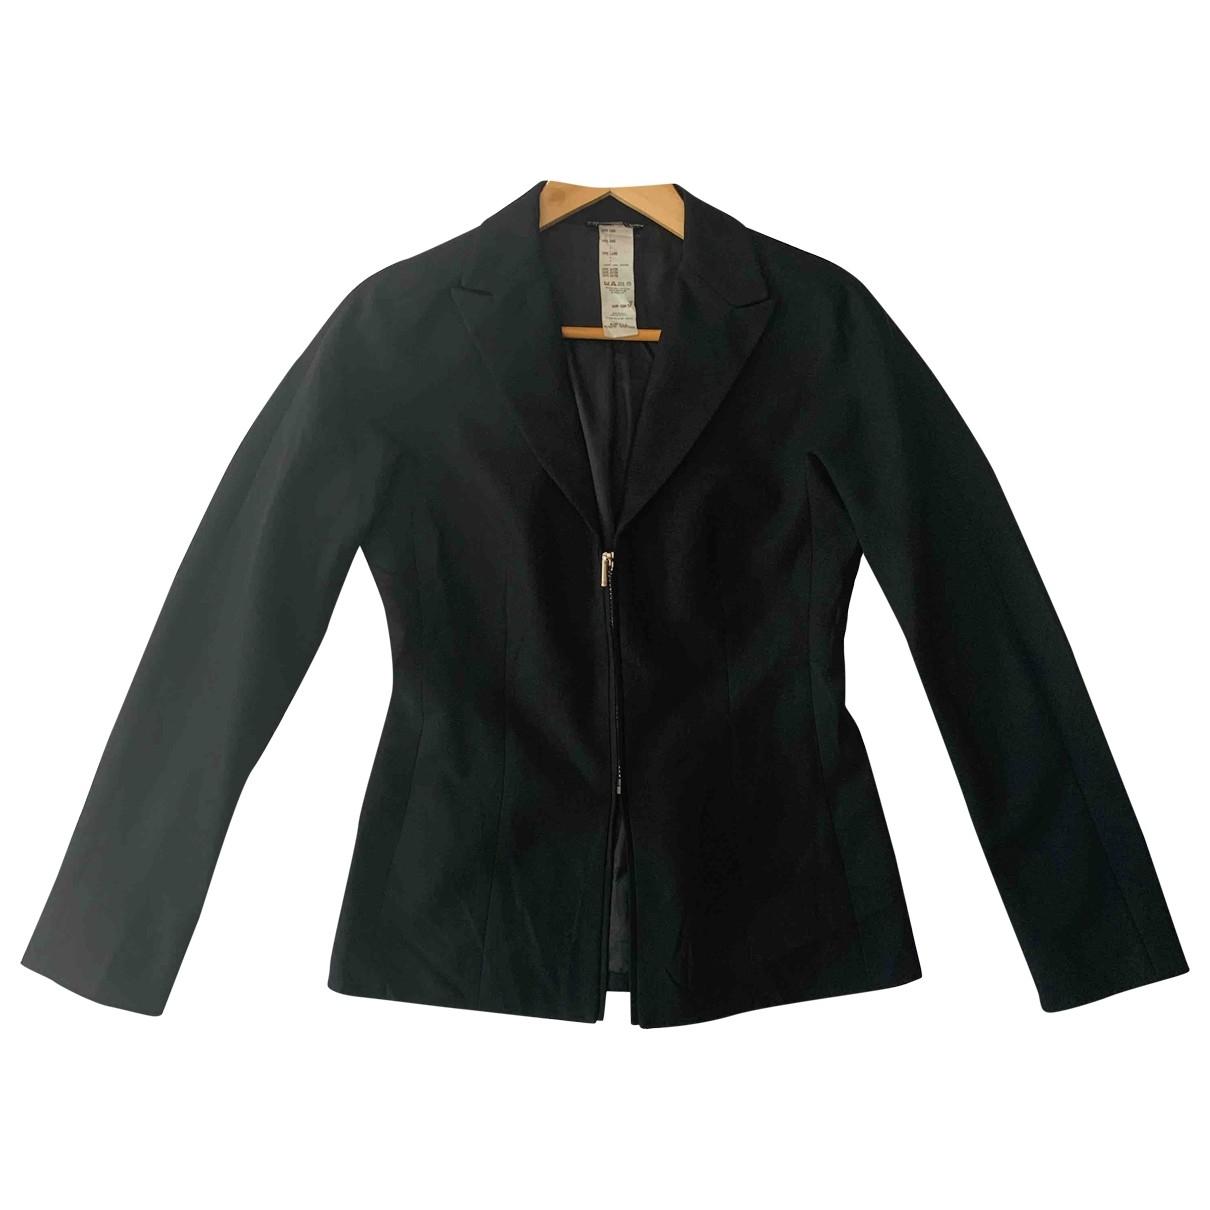 Gianni Versace \N Jacke in  Schwarz Wolle